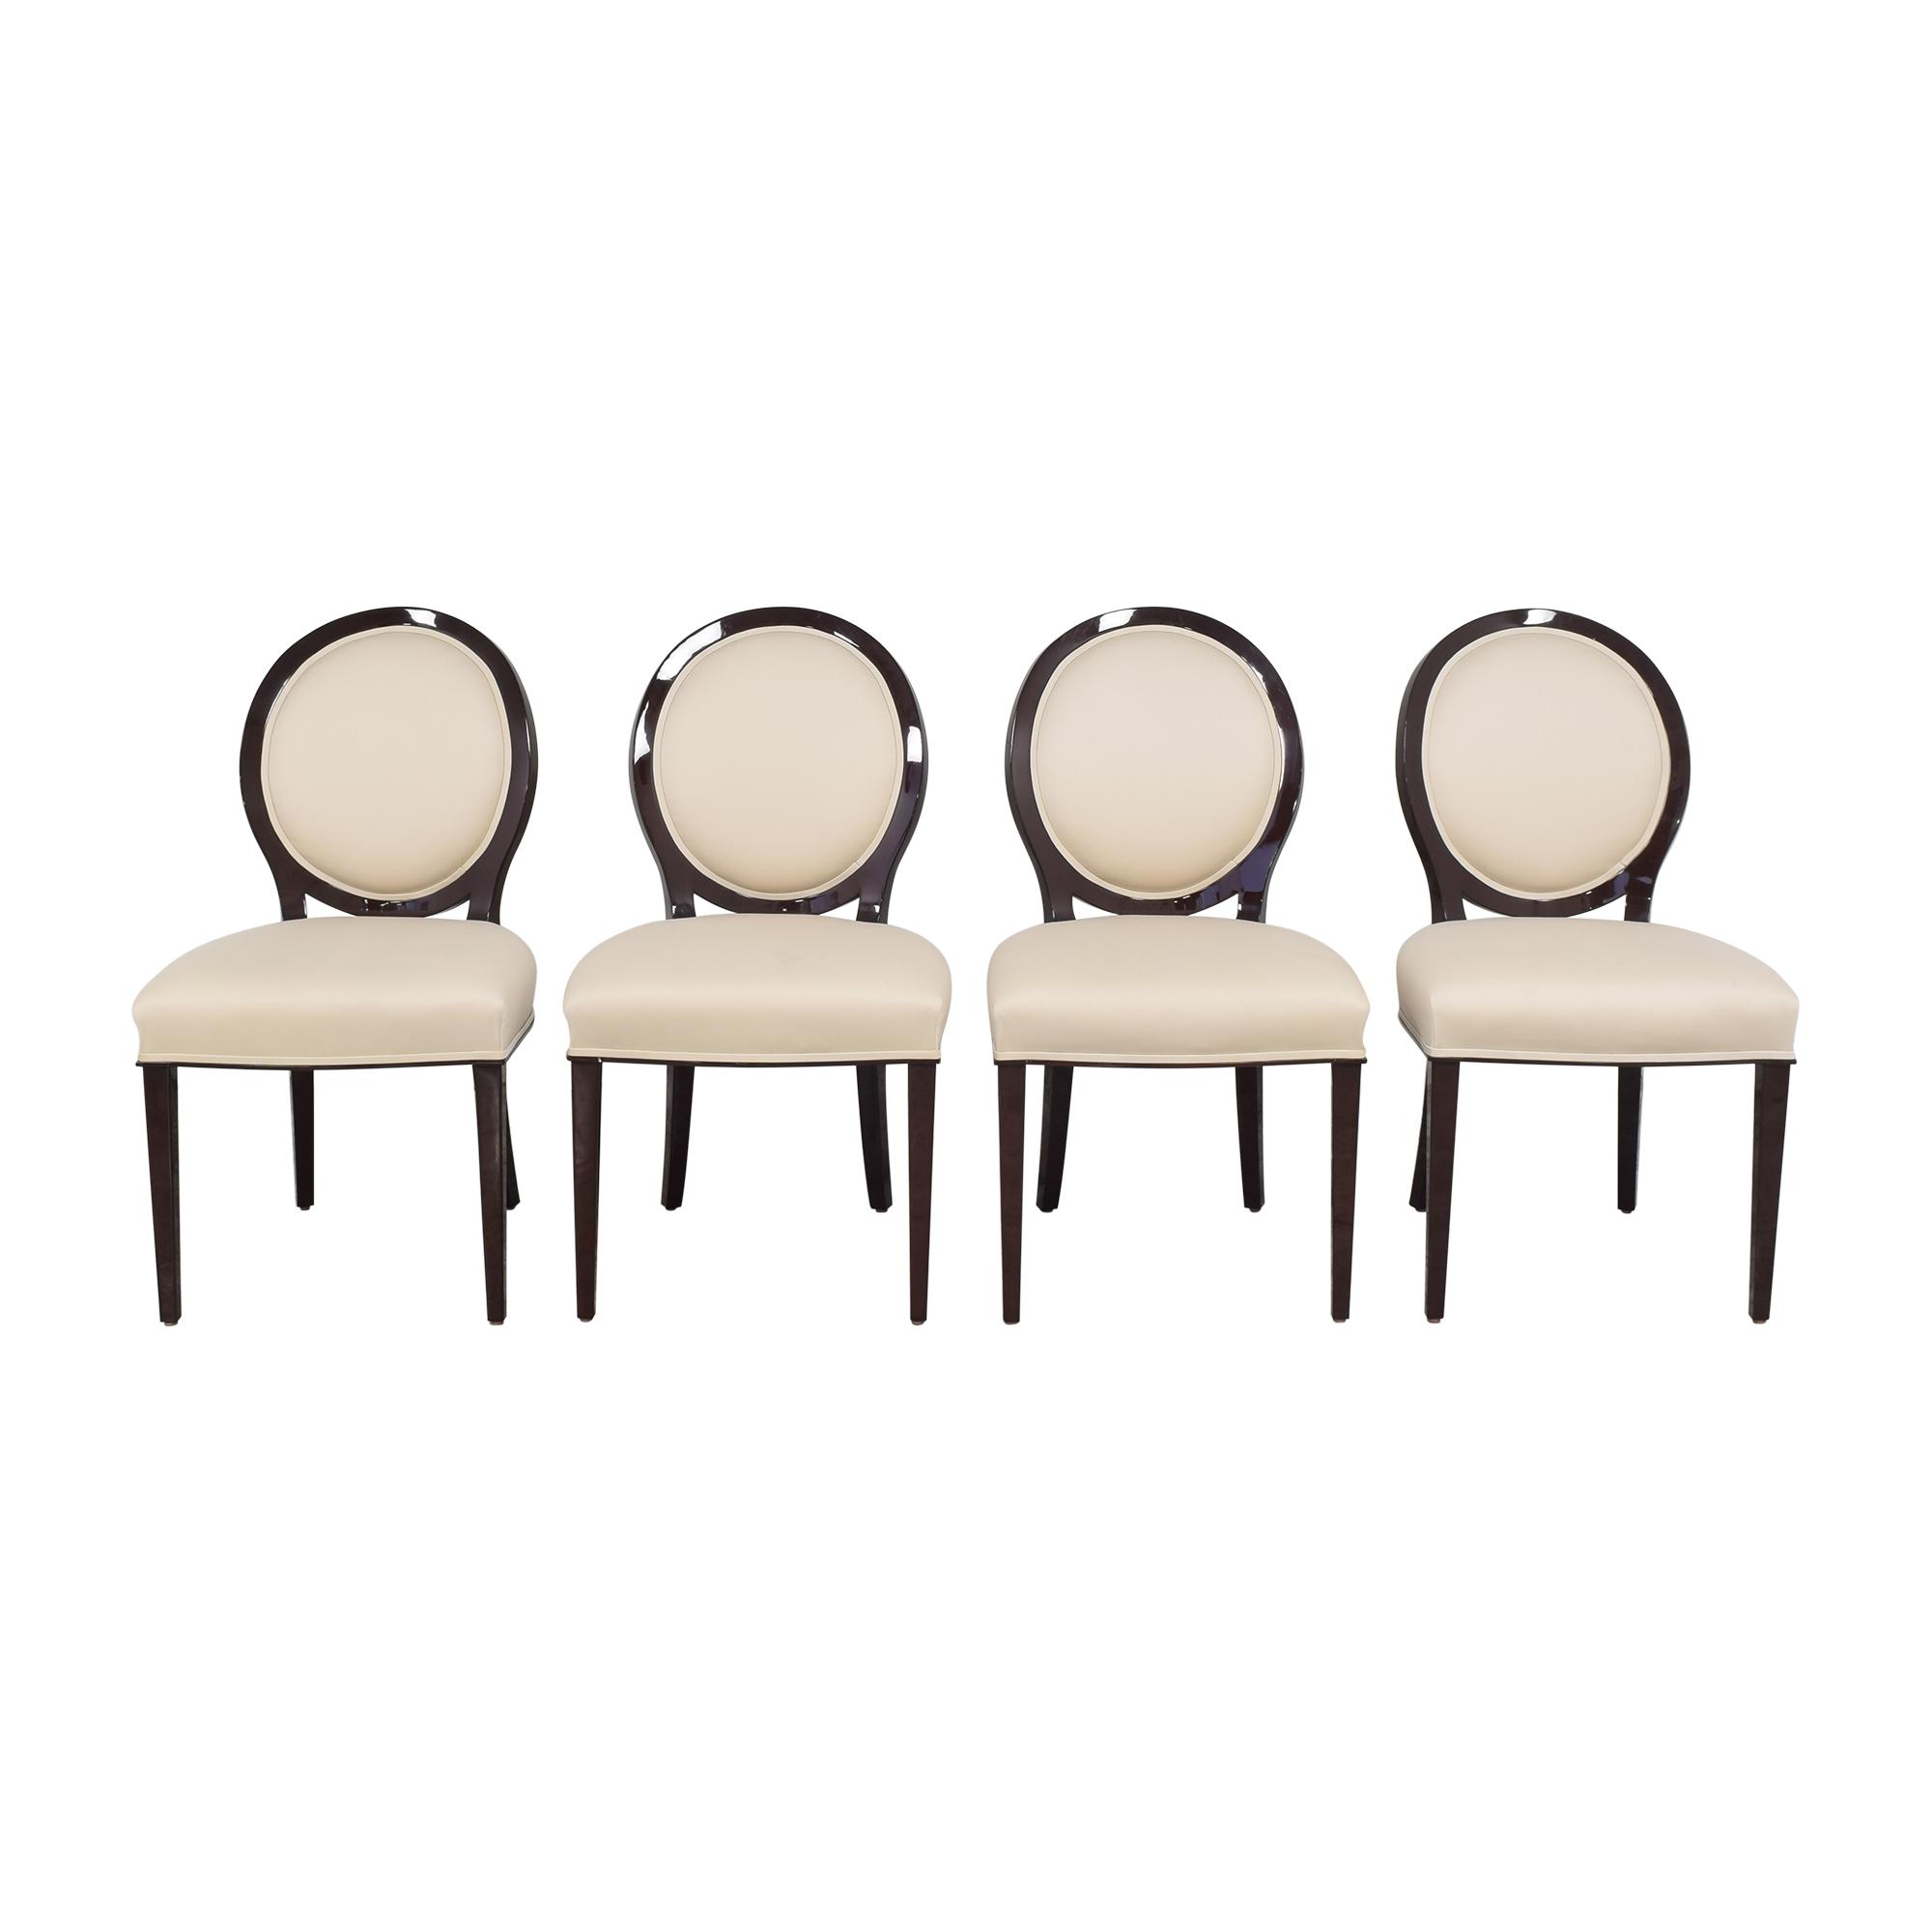 buy Nancy Corzine Sanford Side Dining Chairs Nancy Corzine Chairs